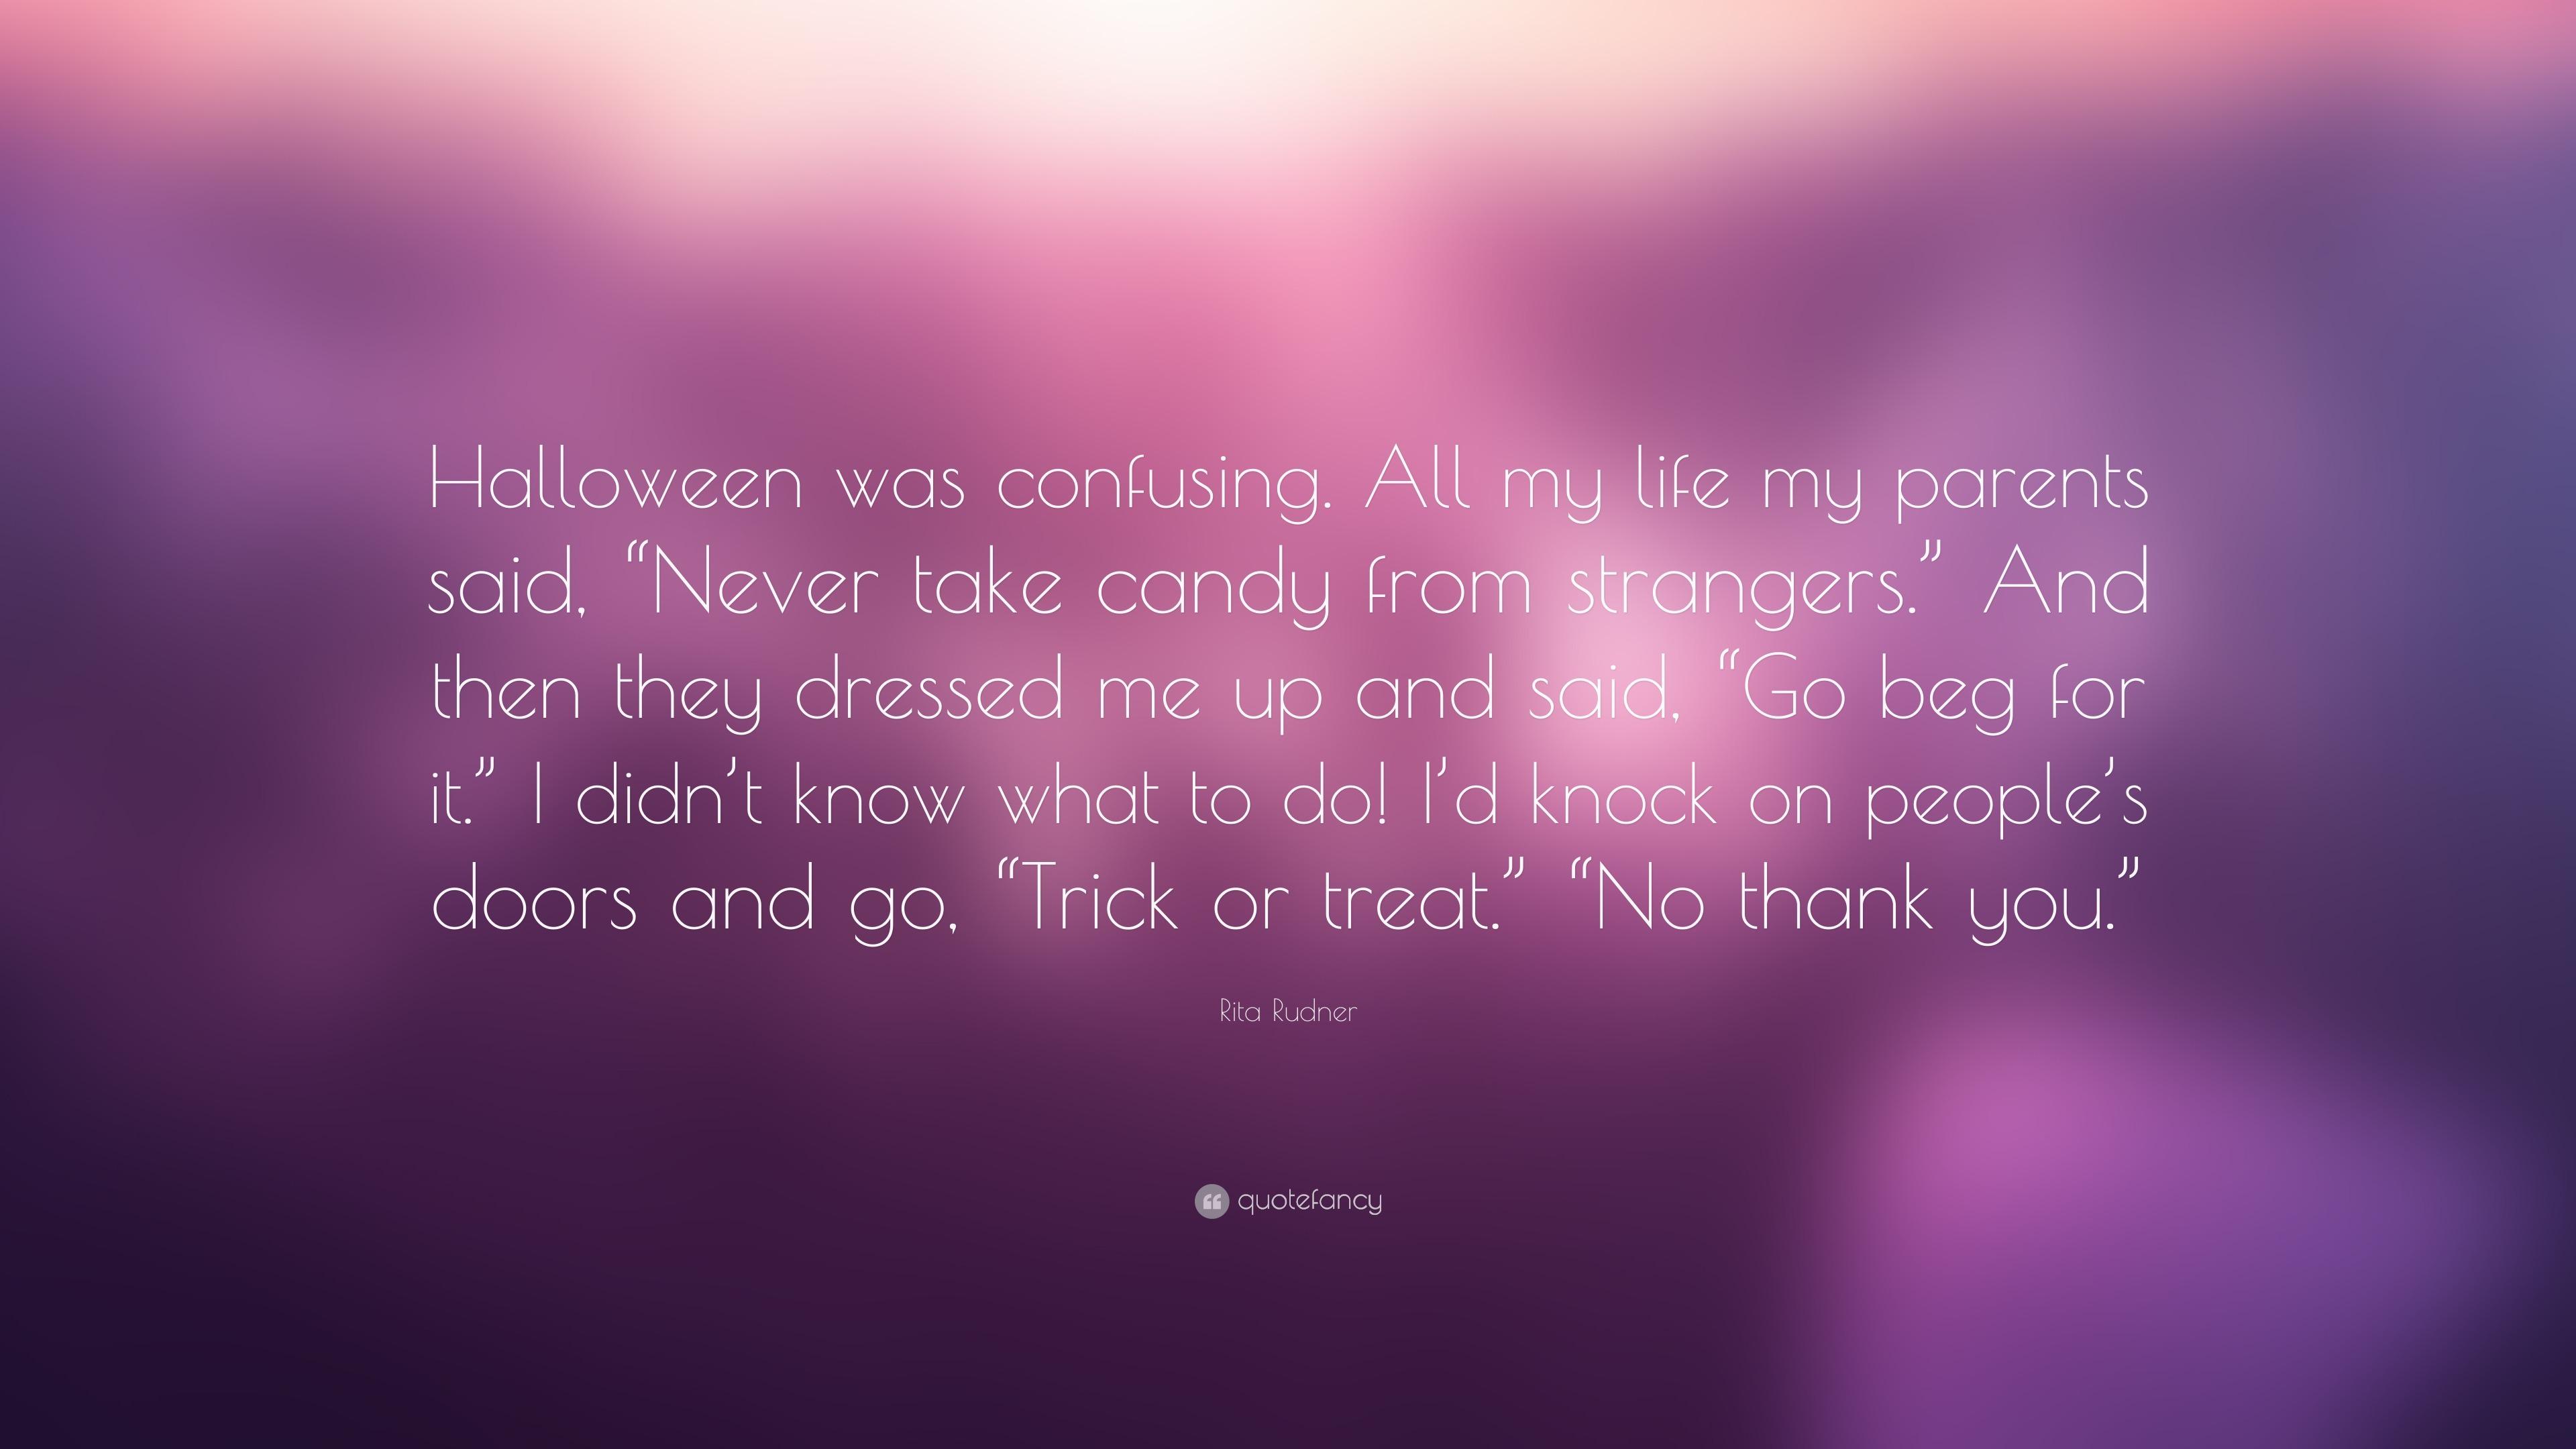 Amazing Wallpaper Halloween Pink - 730213-Rita-Rudner-Quote-Halloween-was-confusing-All-my-life-my-parents  Trends_829736.jpg